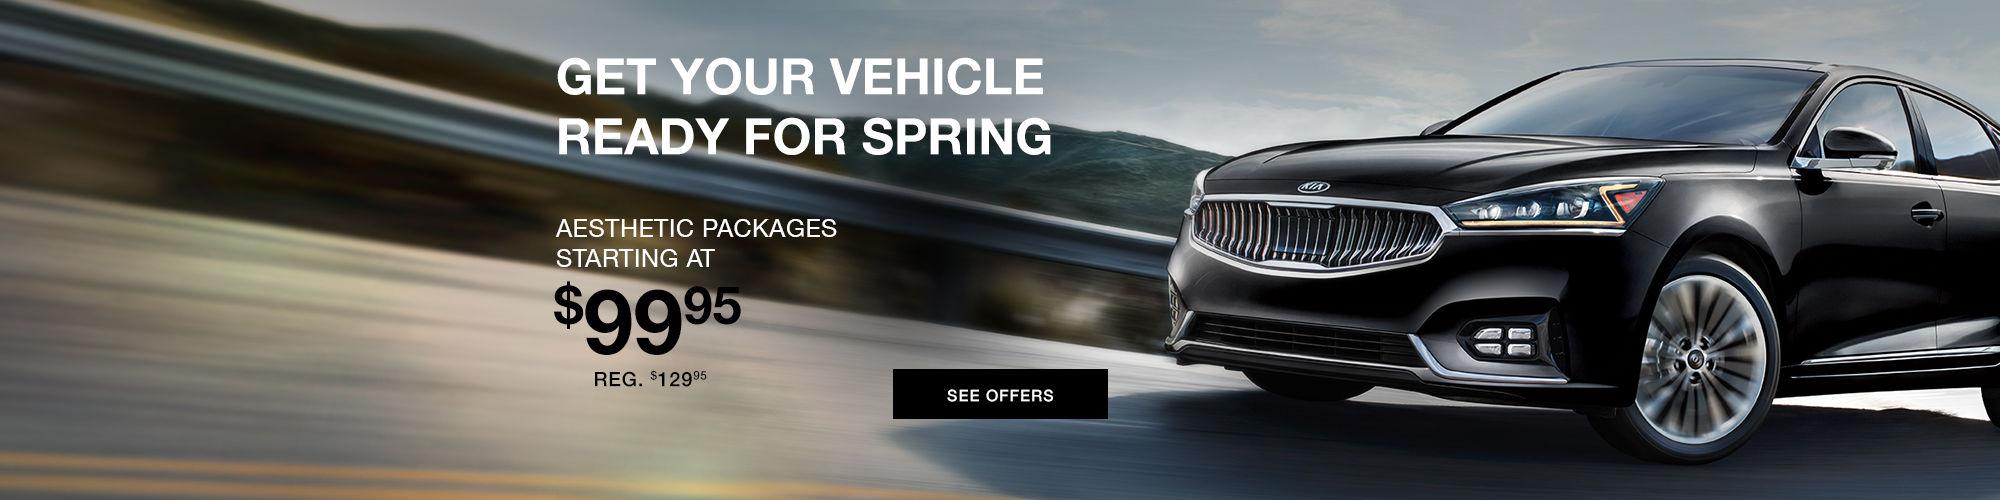 Spring car detailing offers